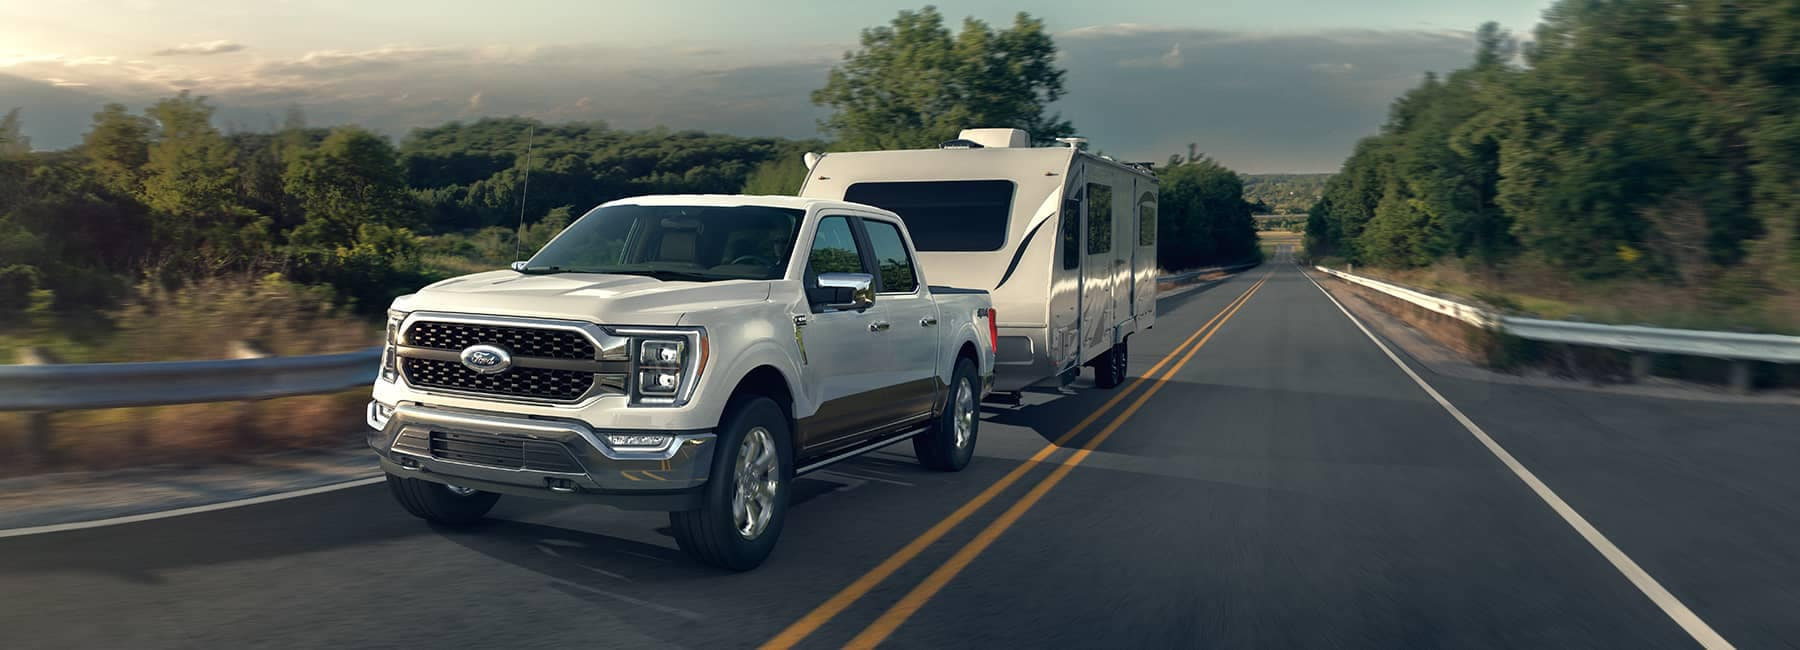 A white 2021 Ford 150 hauling an RV trailer along a mountain road